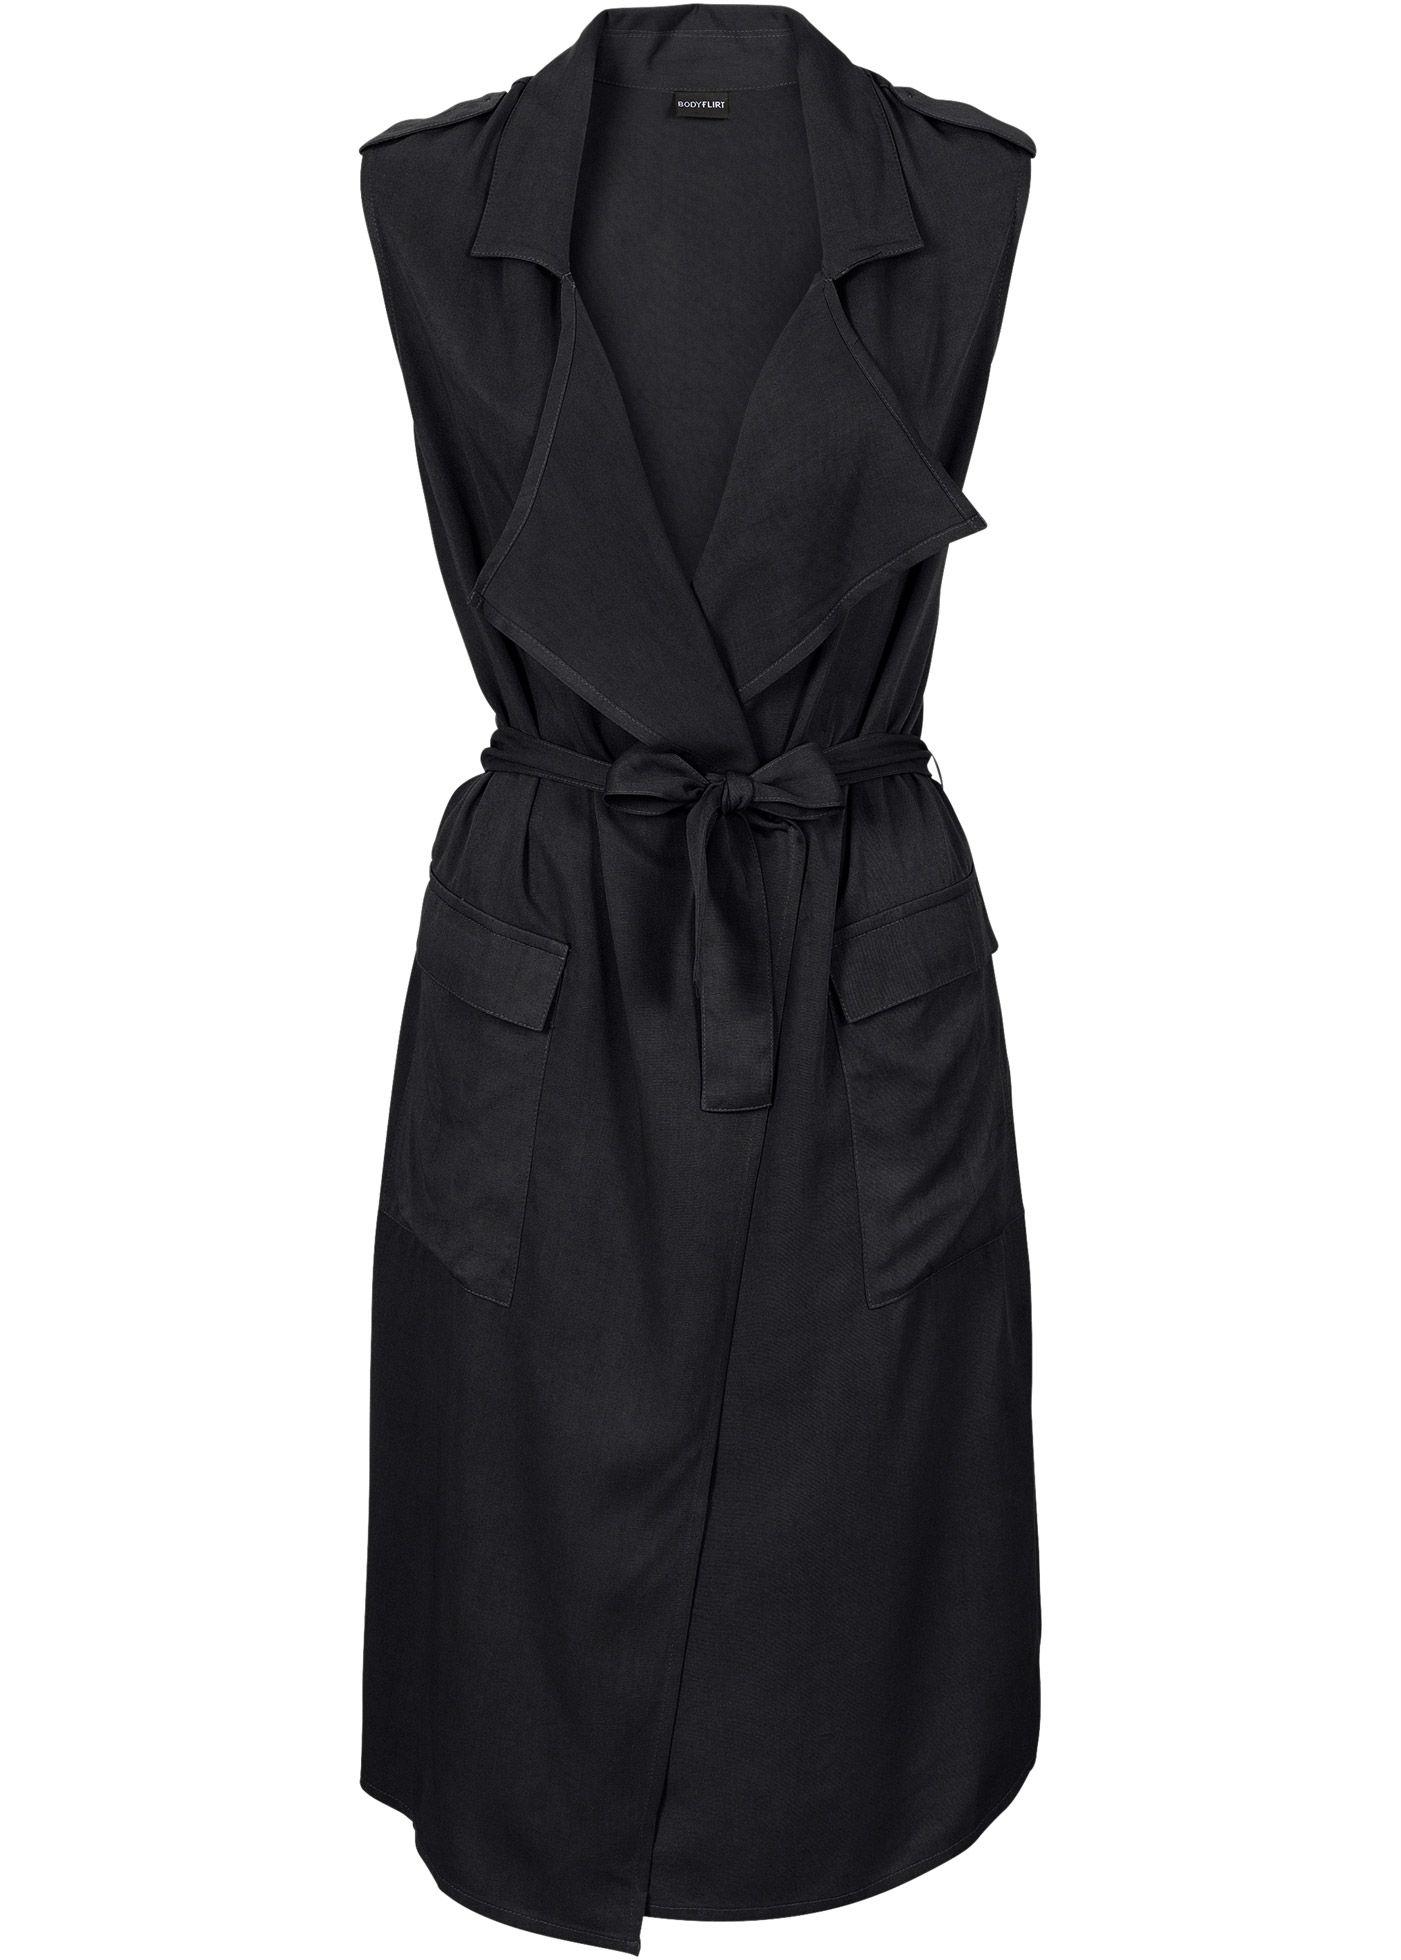 c794551b2 Bonprix Collection - BODYFLIRT Kruvaze elbise - Siyah Vestido Envelope,  Brand Store, Maine,